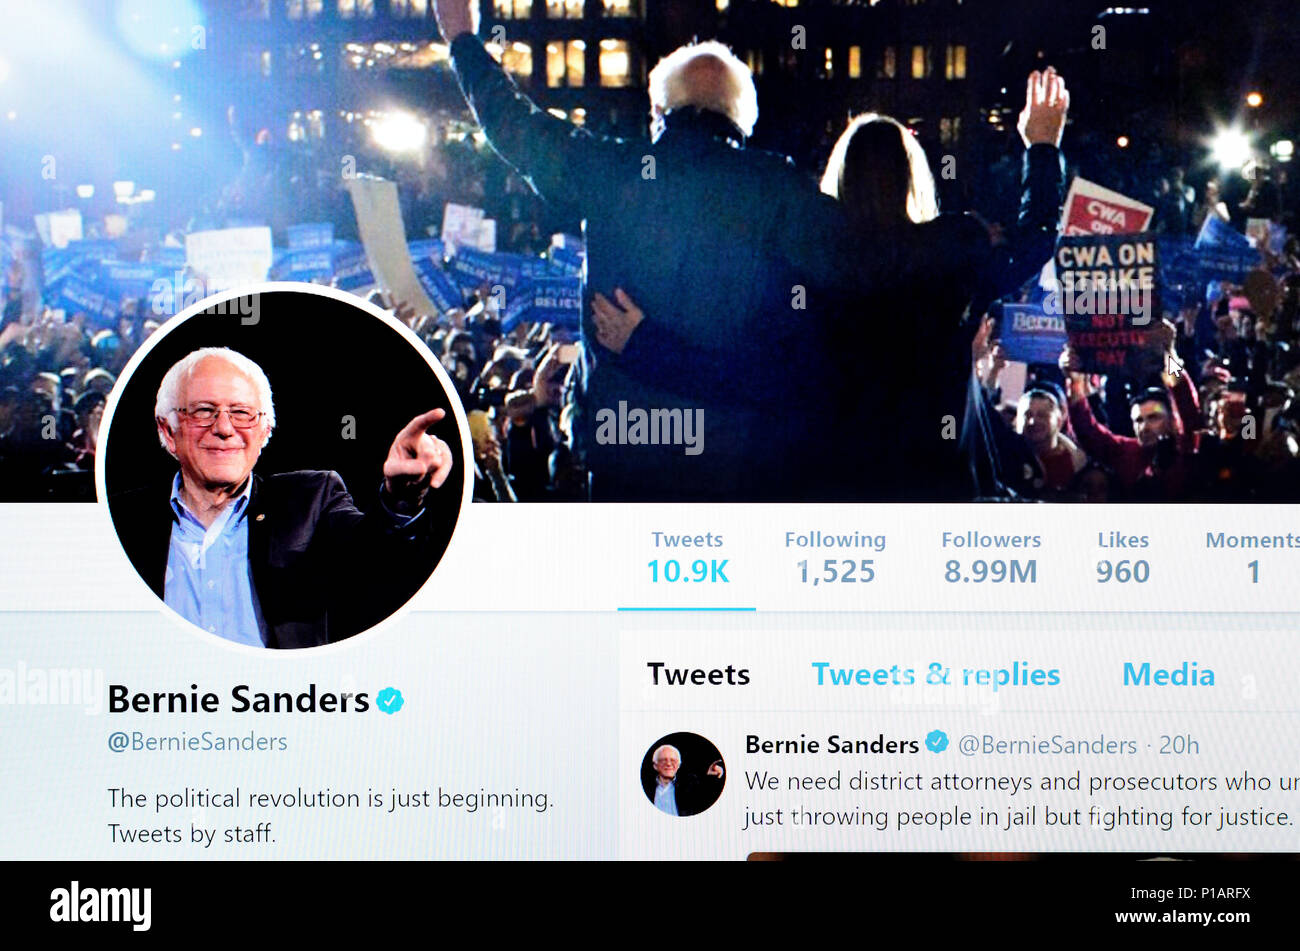 Bernie Sanders Twitter account home page (June 2018) - Stock Image